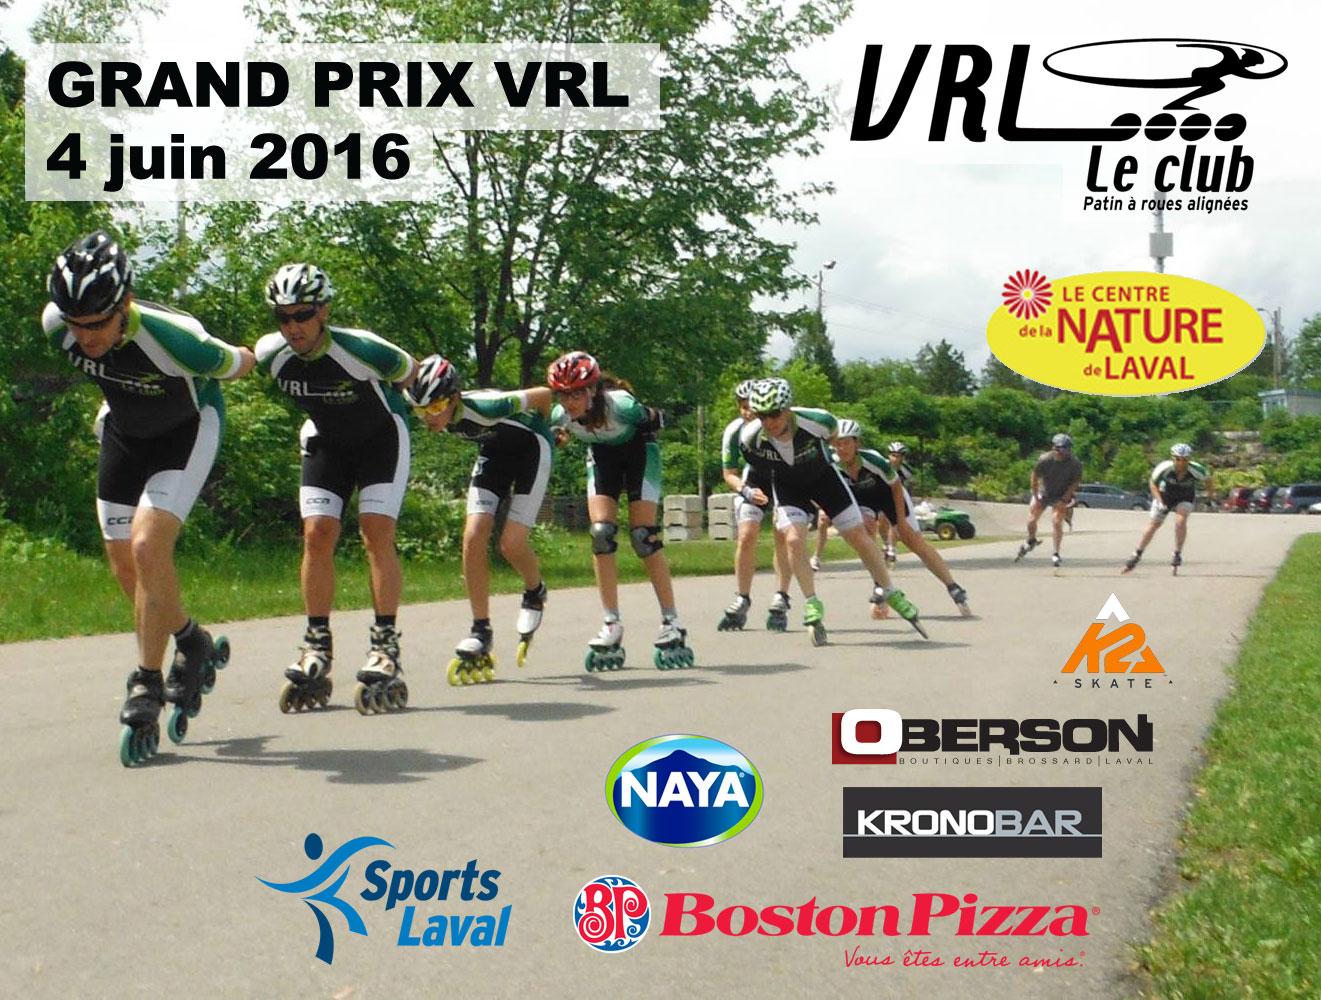 Grand prix VRL 4 juin 2016